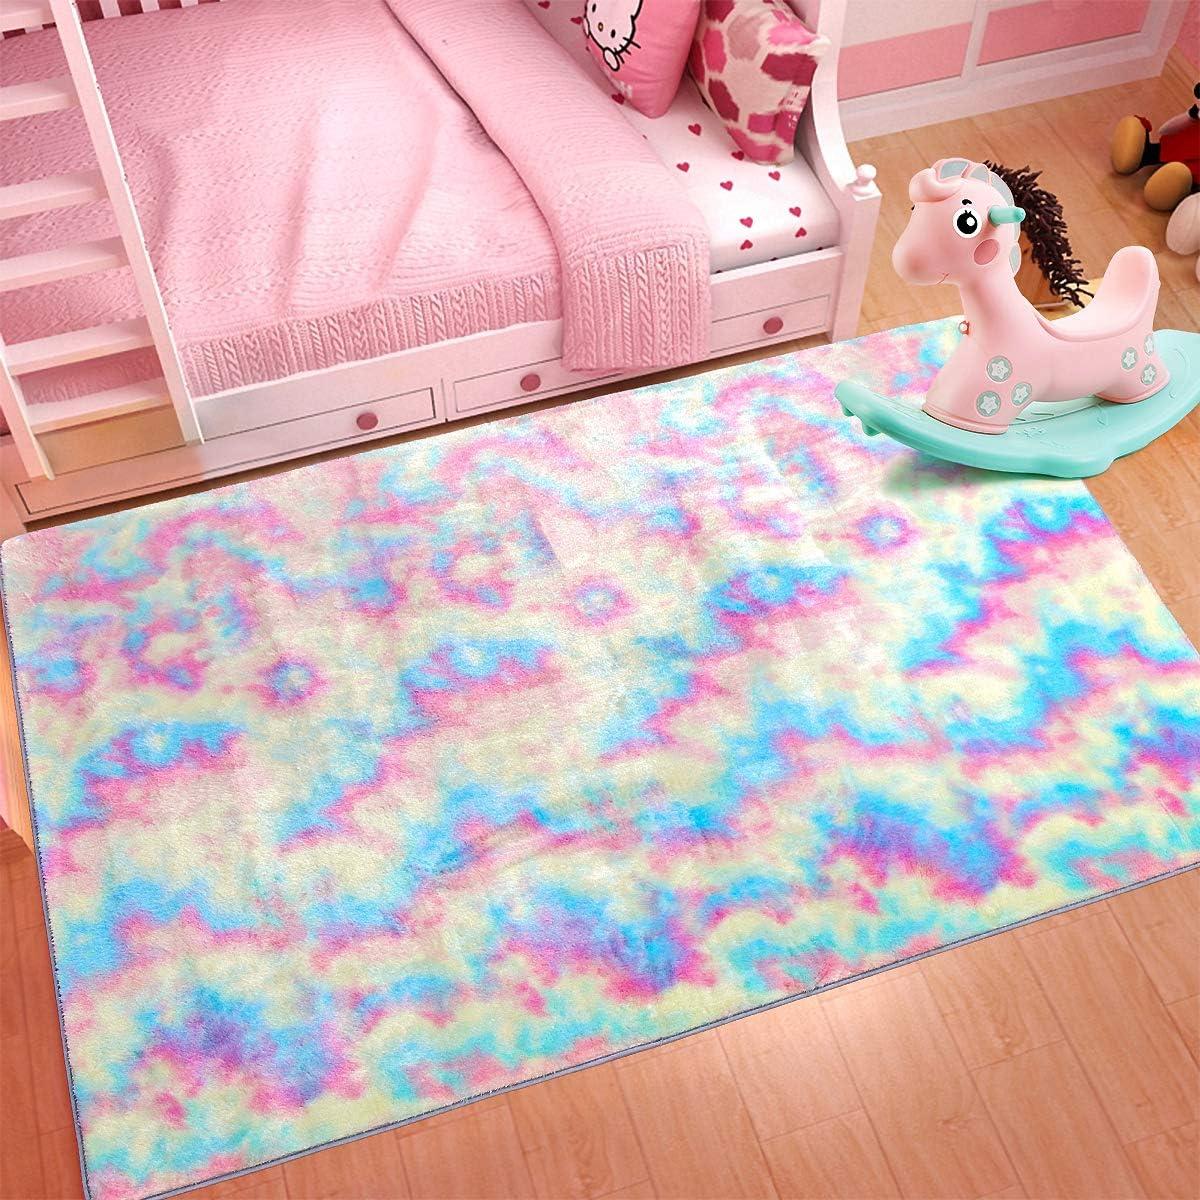 Maxsoft Furry Kids Rainbow Rugs, Colorful Area Rug for Girls Bedroom, Nursery, Play Room, Fuzzy Carpet for Living Room, Home Decor (3x5 Feet)